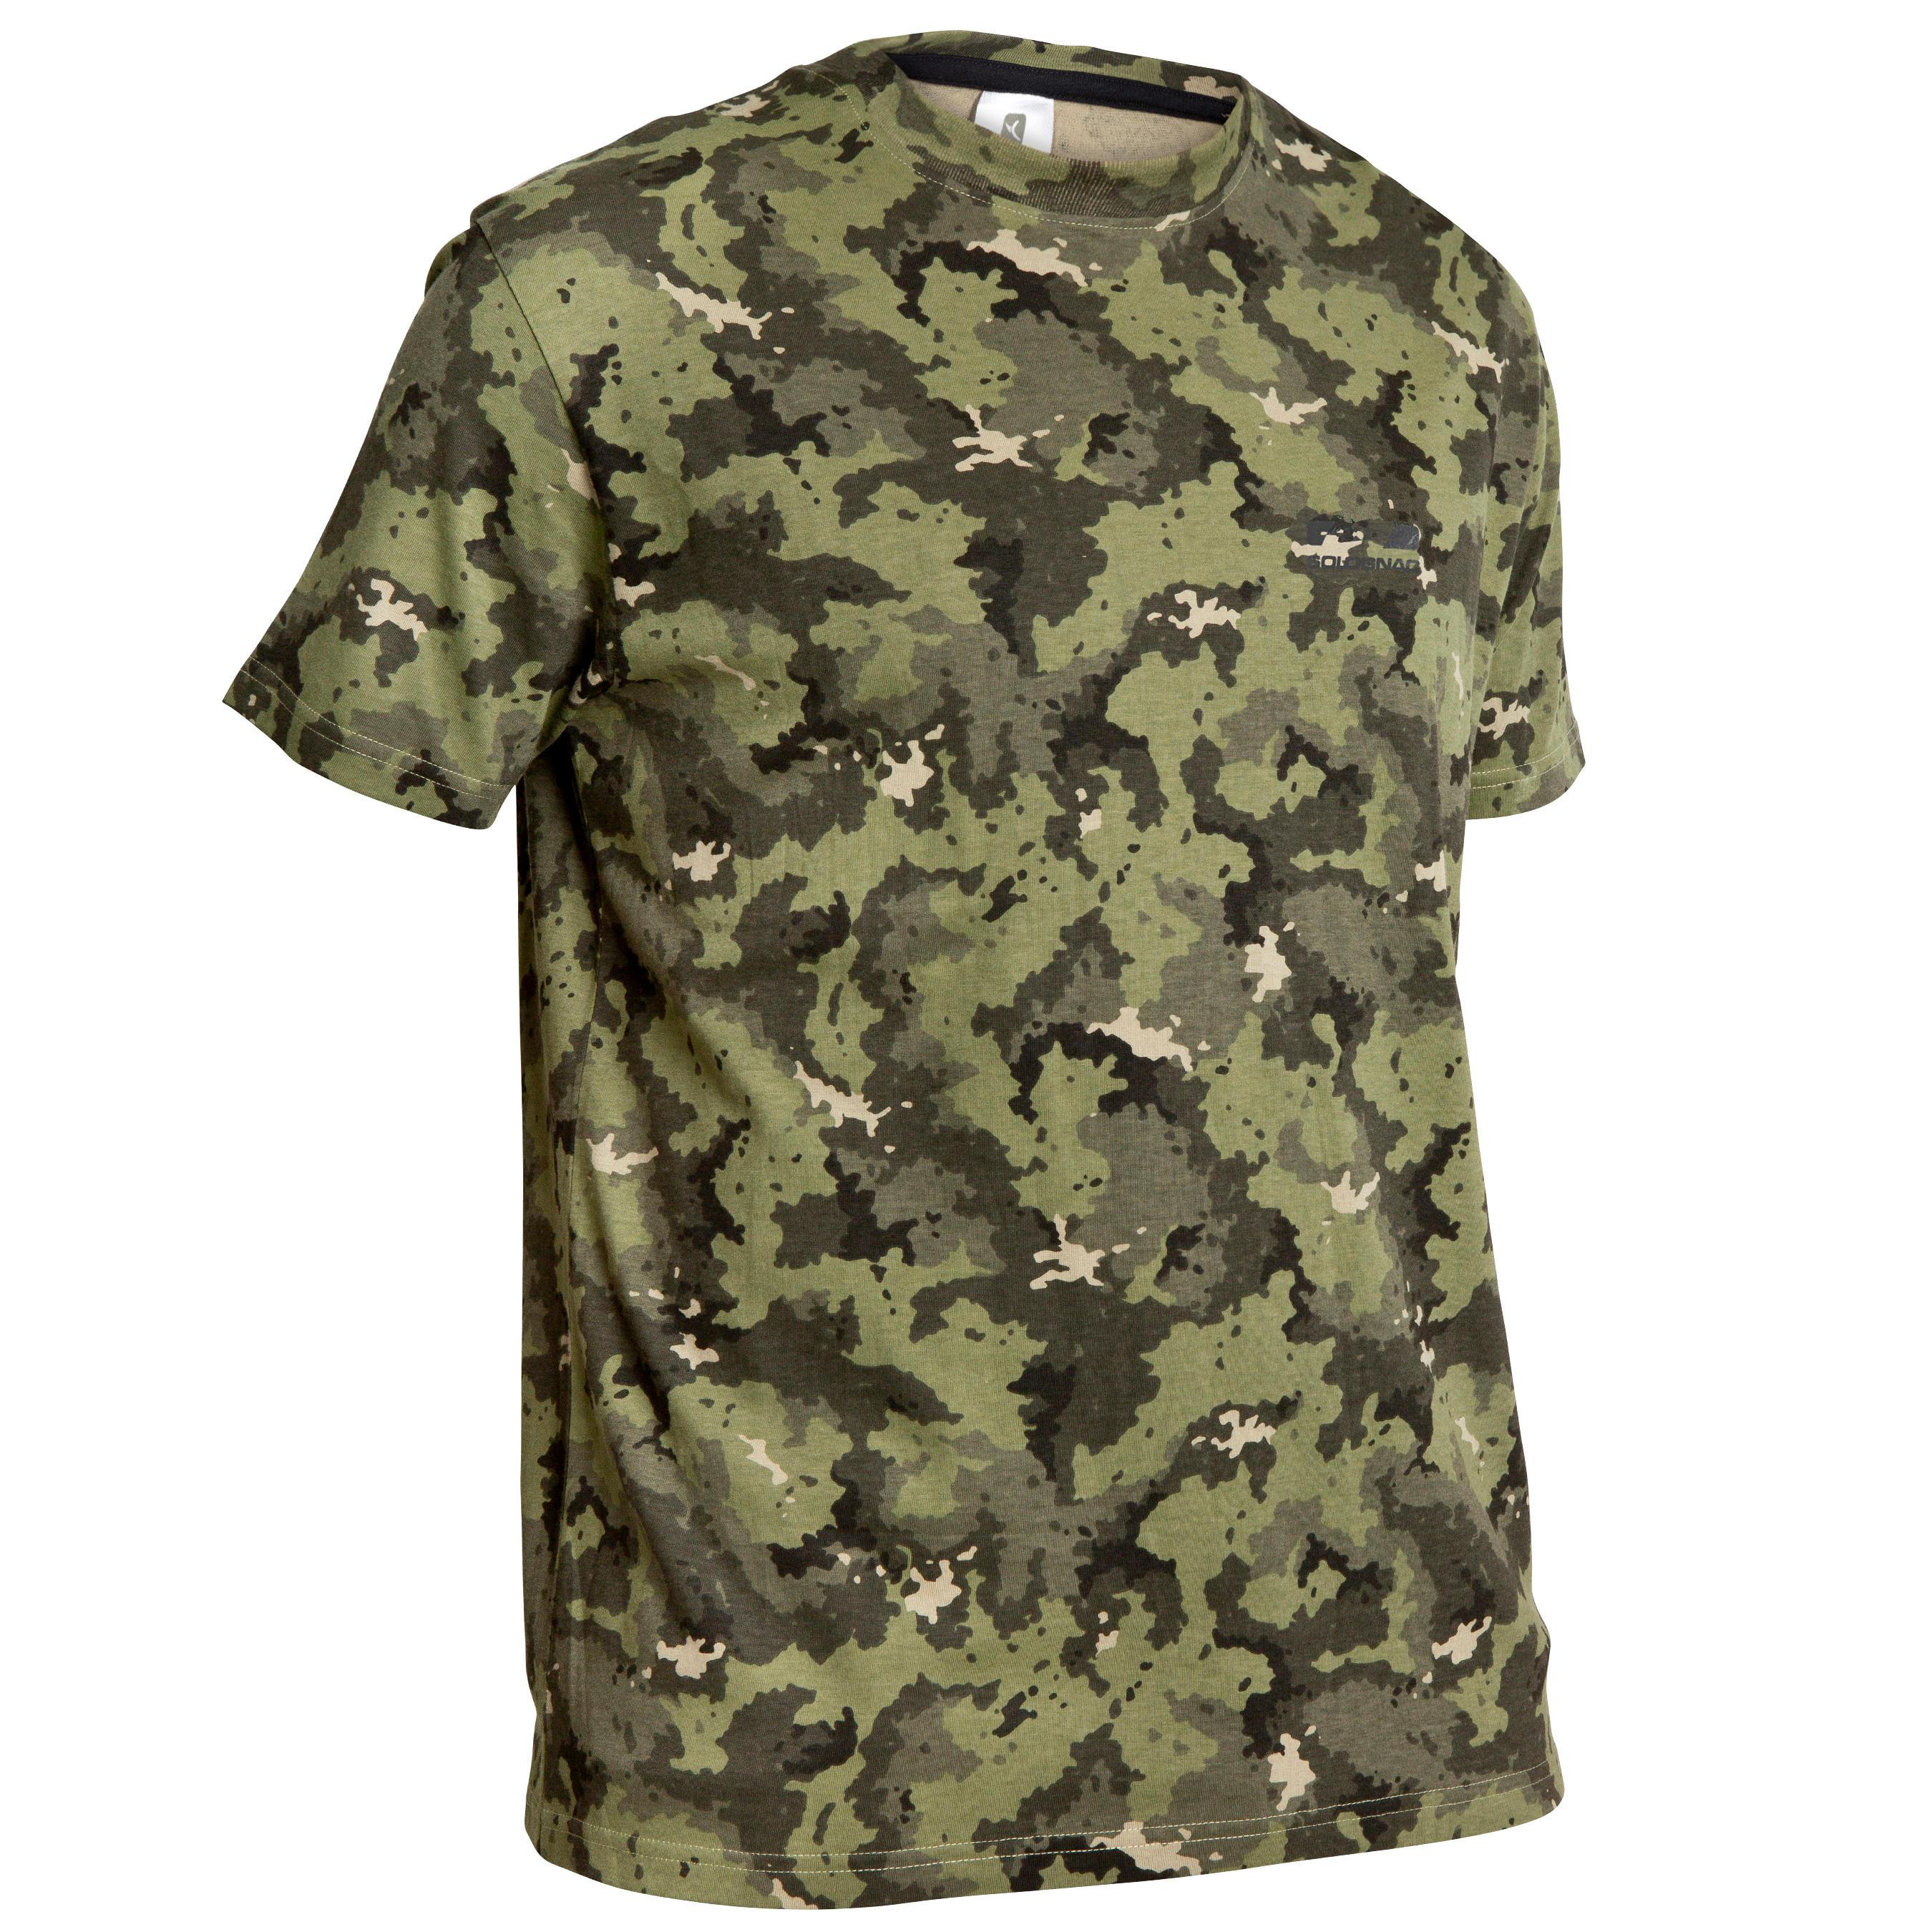 Tee shirt SG100...